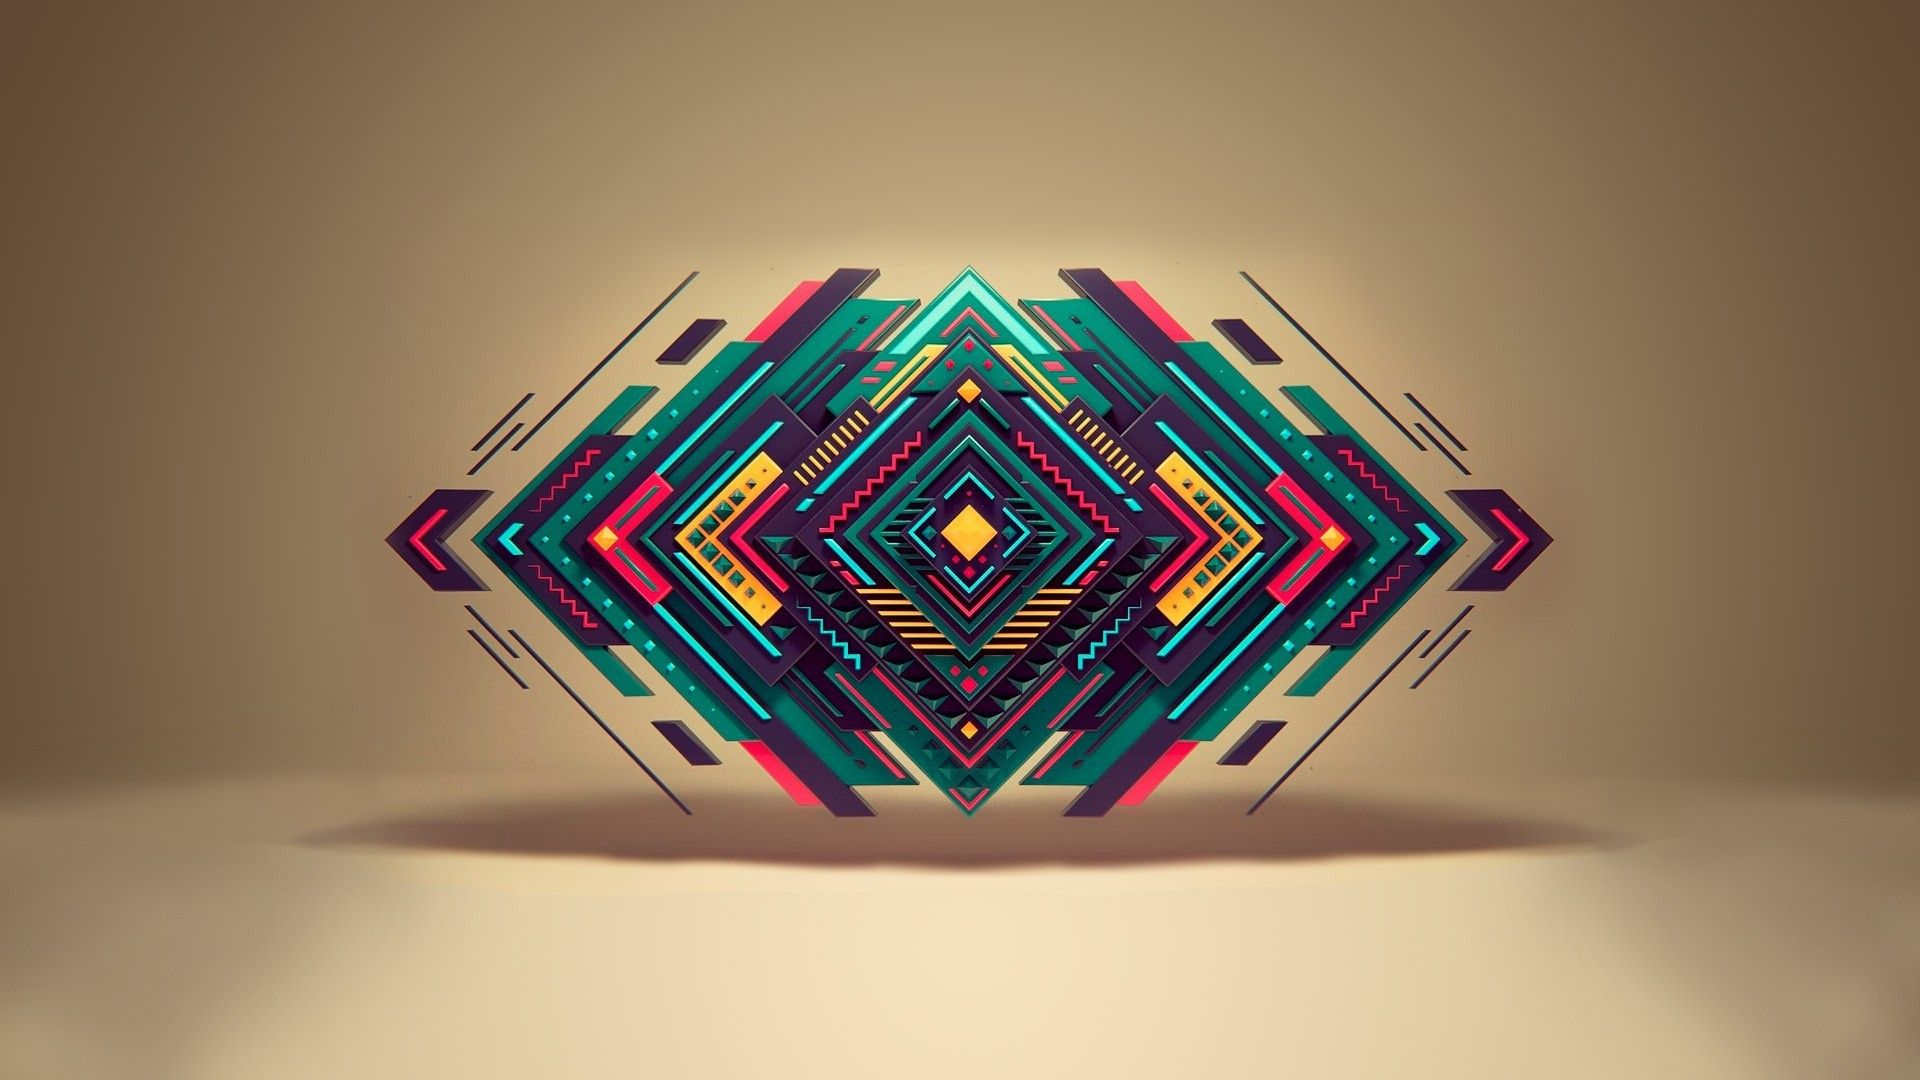 Digital Art Background wallpaper for computer